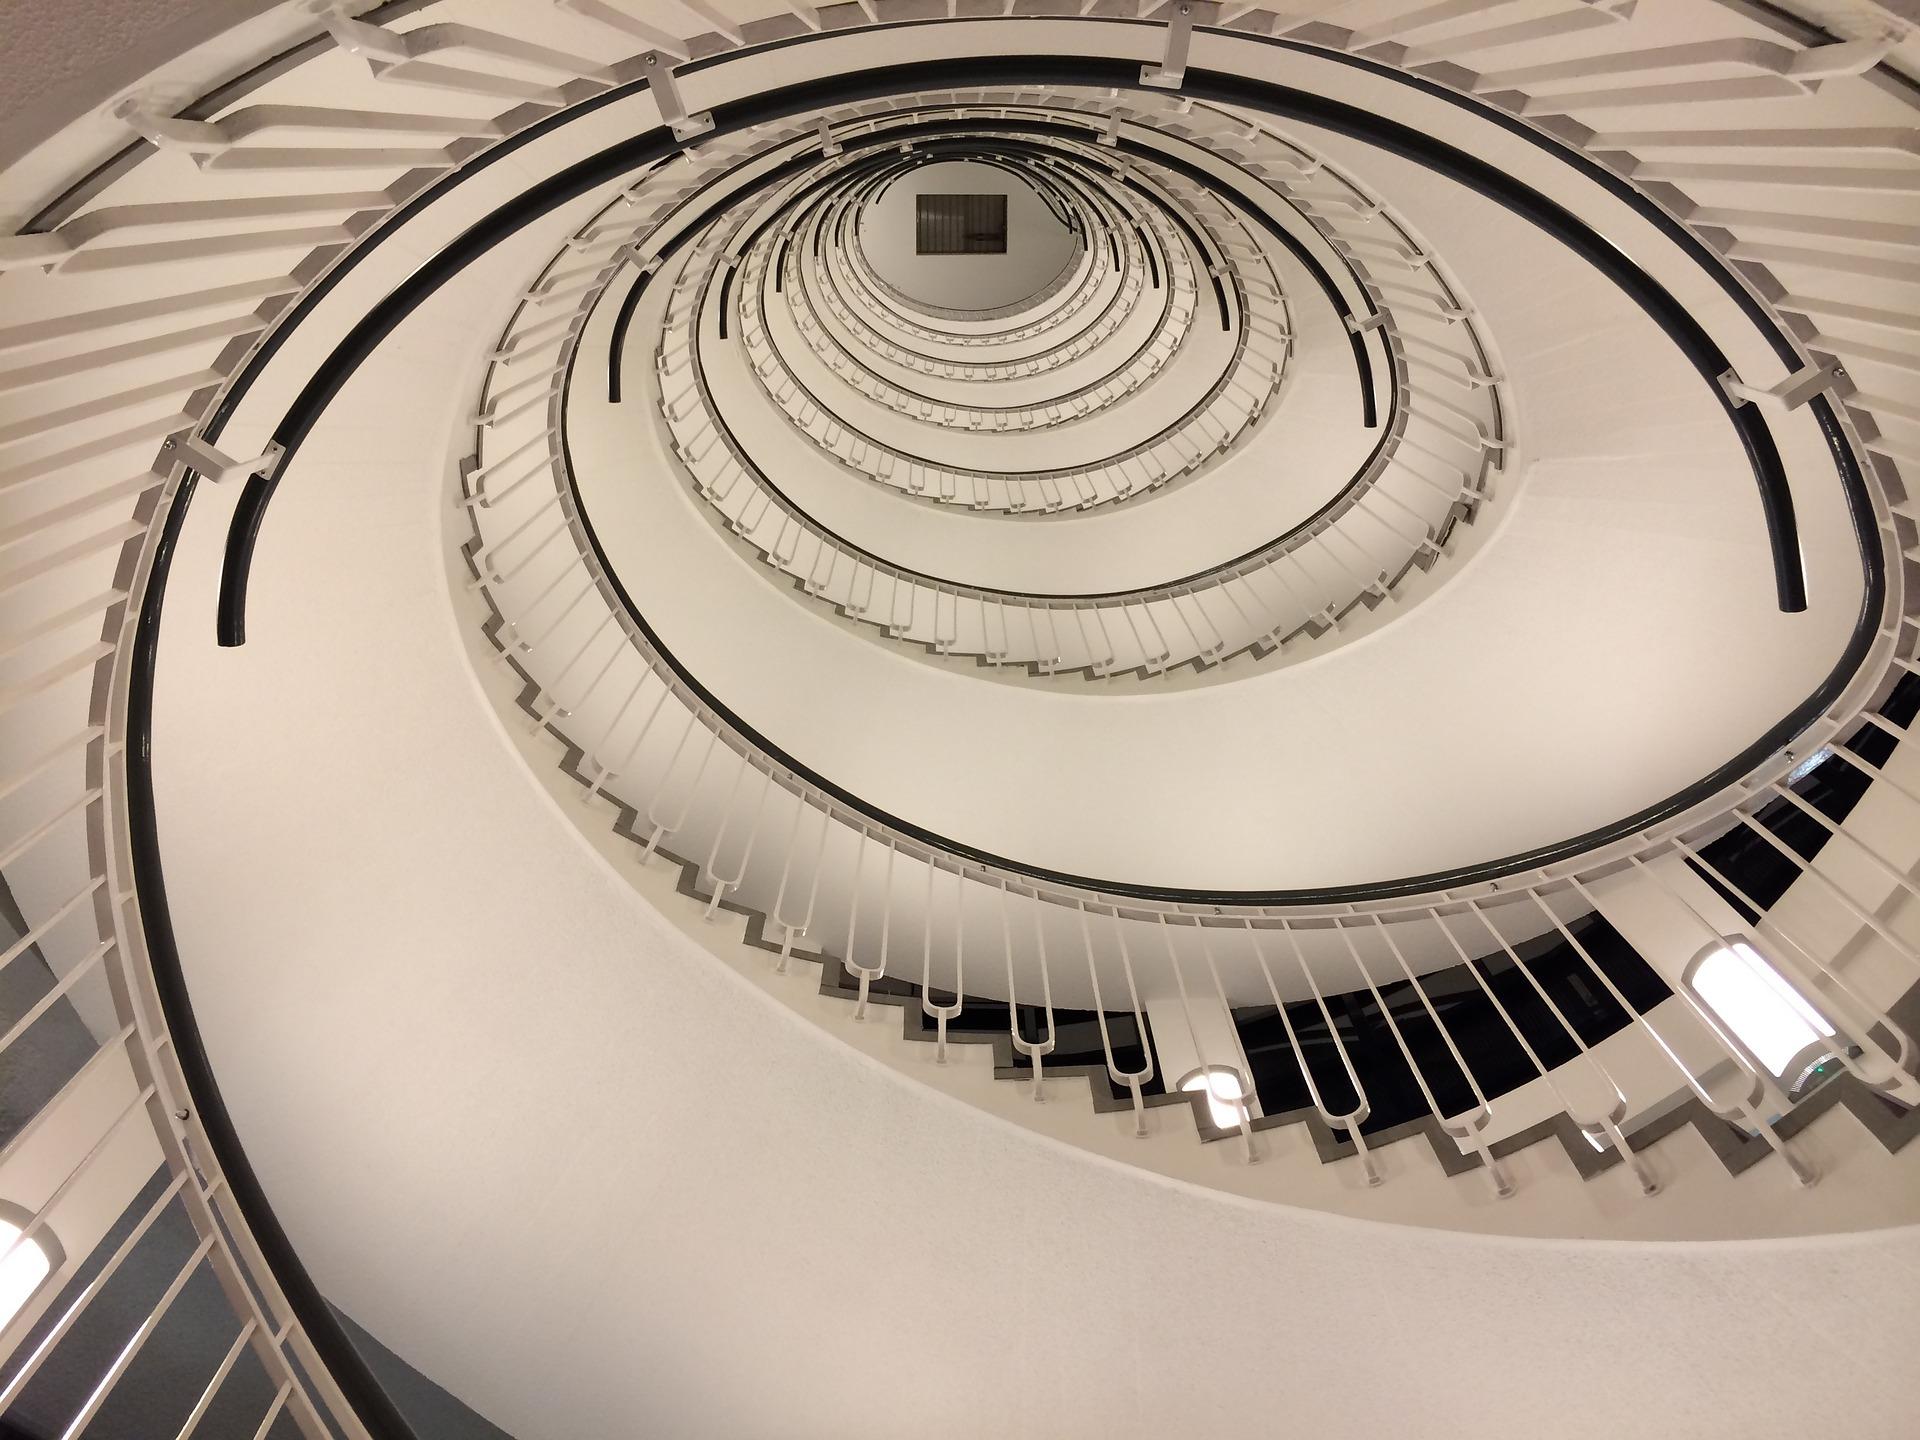 Spiraling Architecture